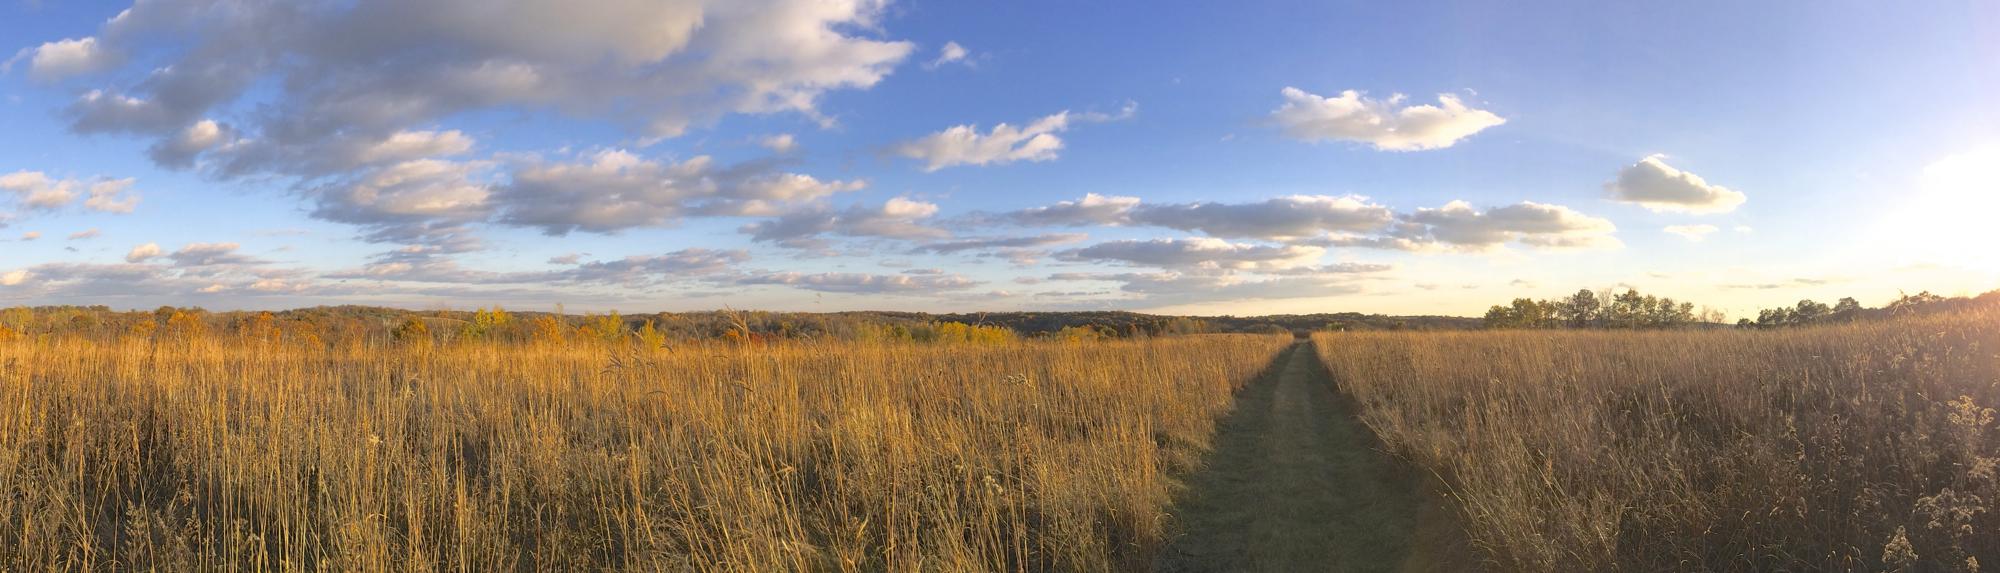 11-1-13 Western Prairie panorama lg